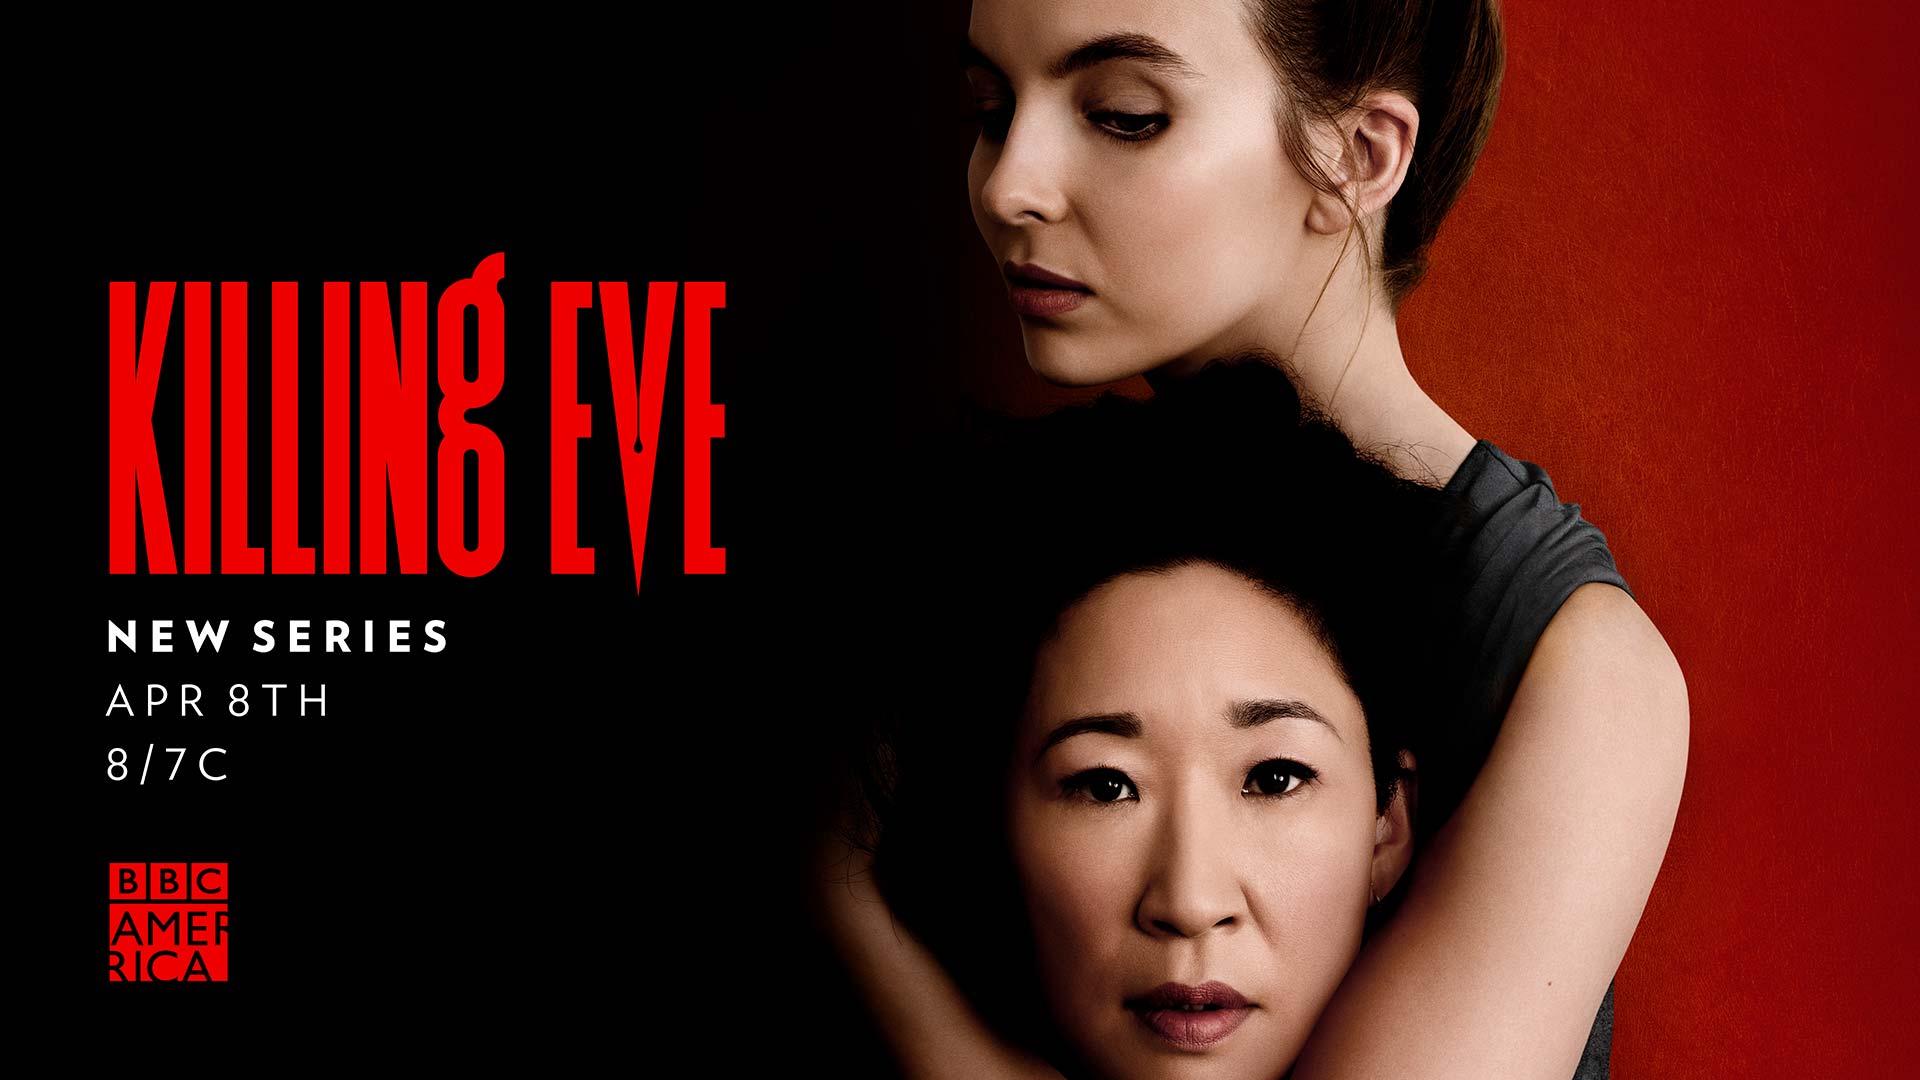 New Show Introduction Killing Eve Rueben S Ramblings